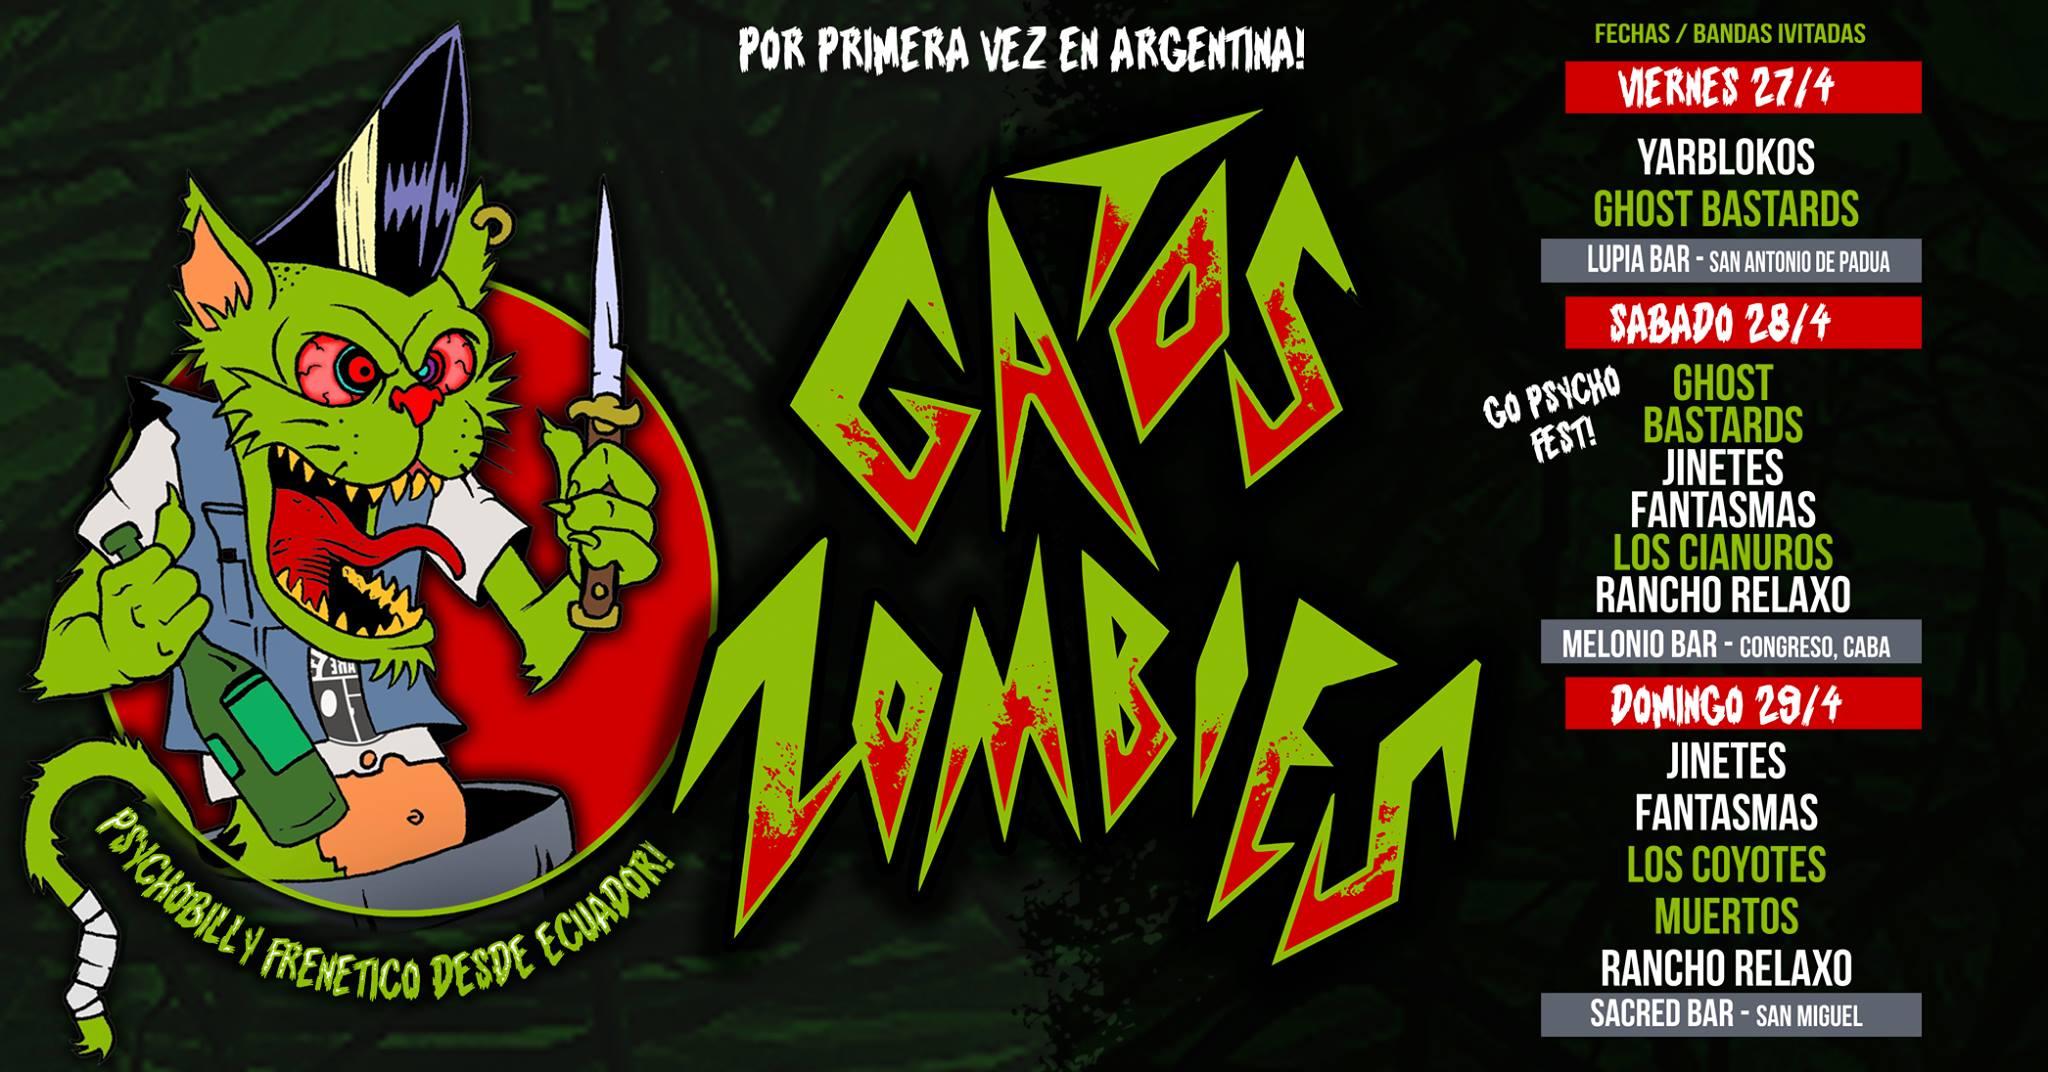 Gatos Zombies en Argentina! Psychobilly desde Ecuador!